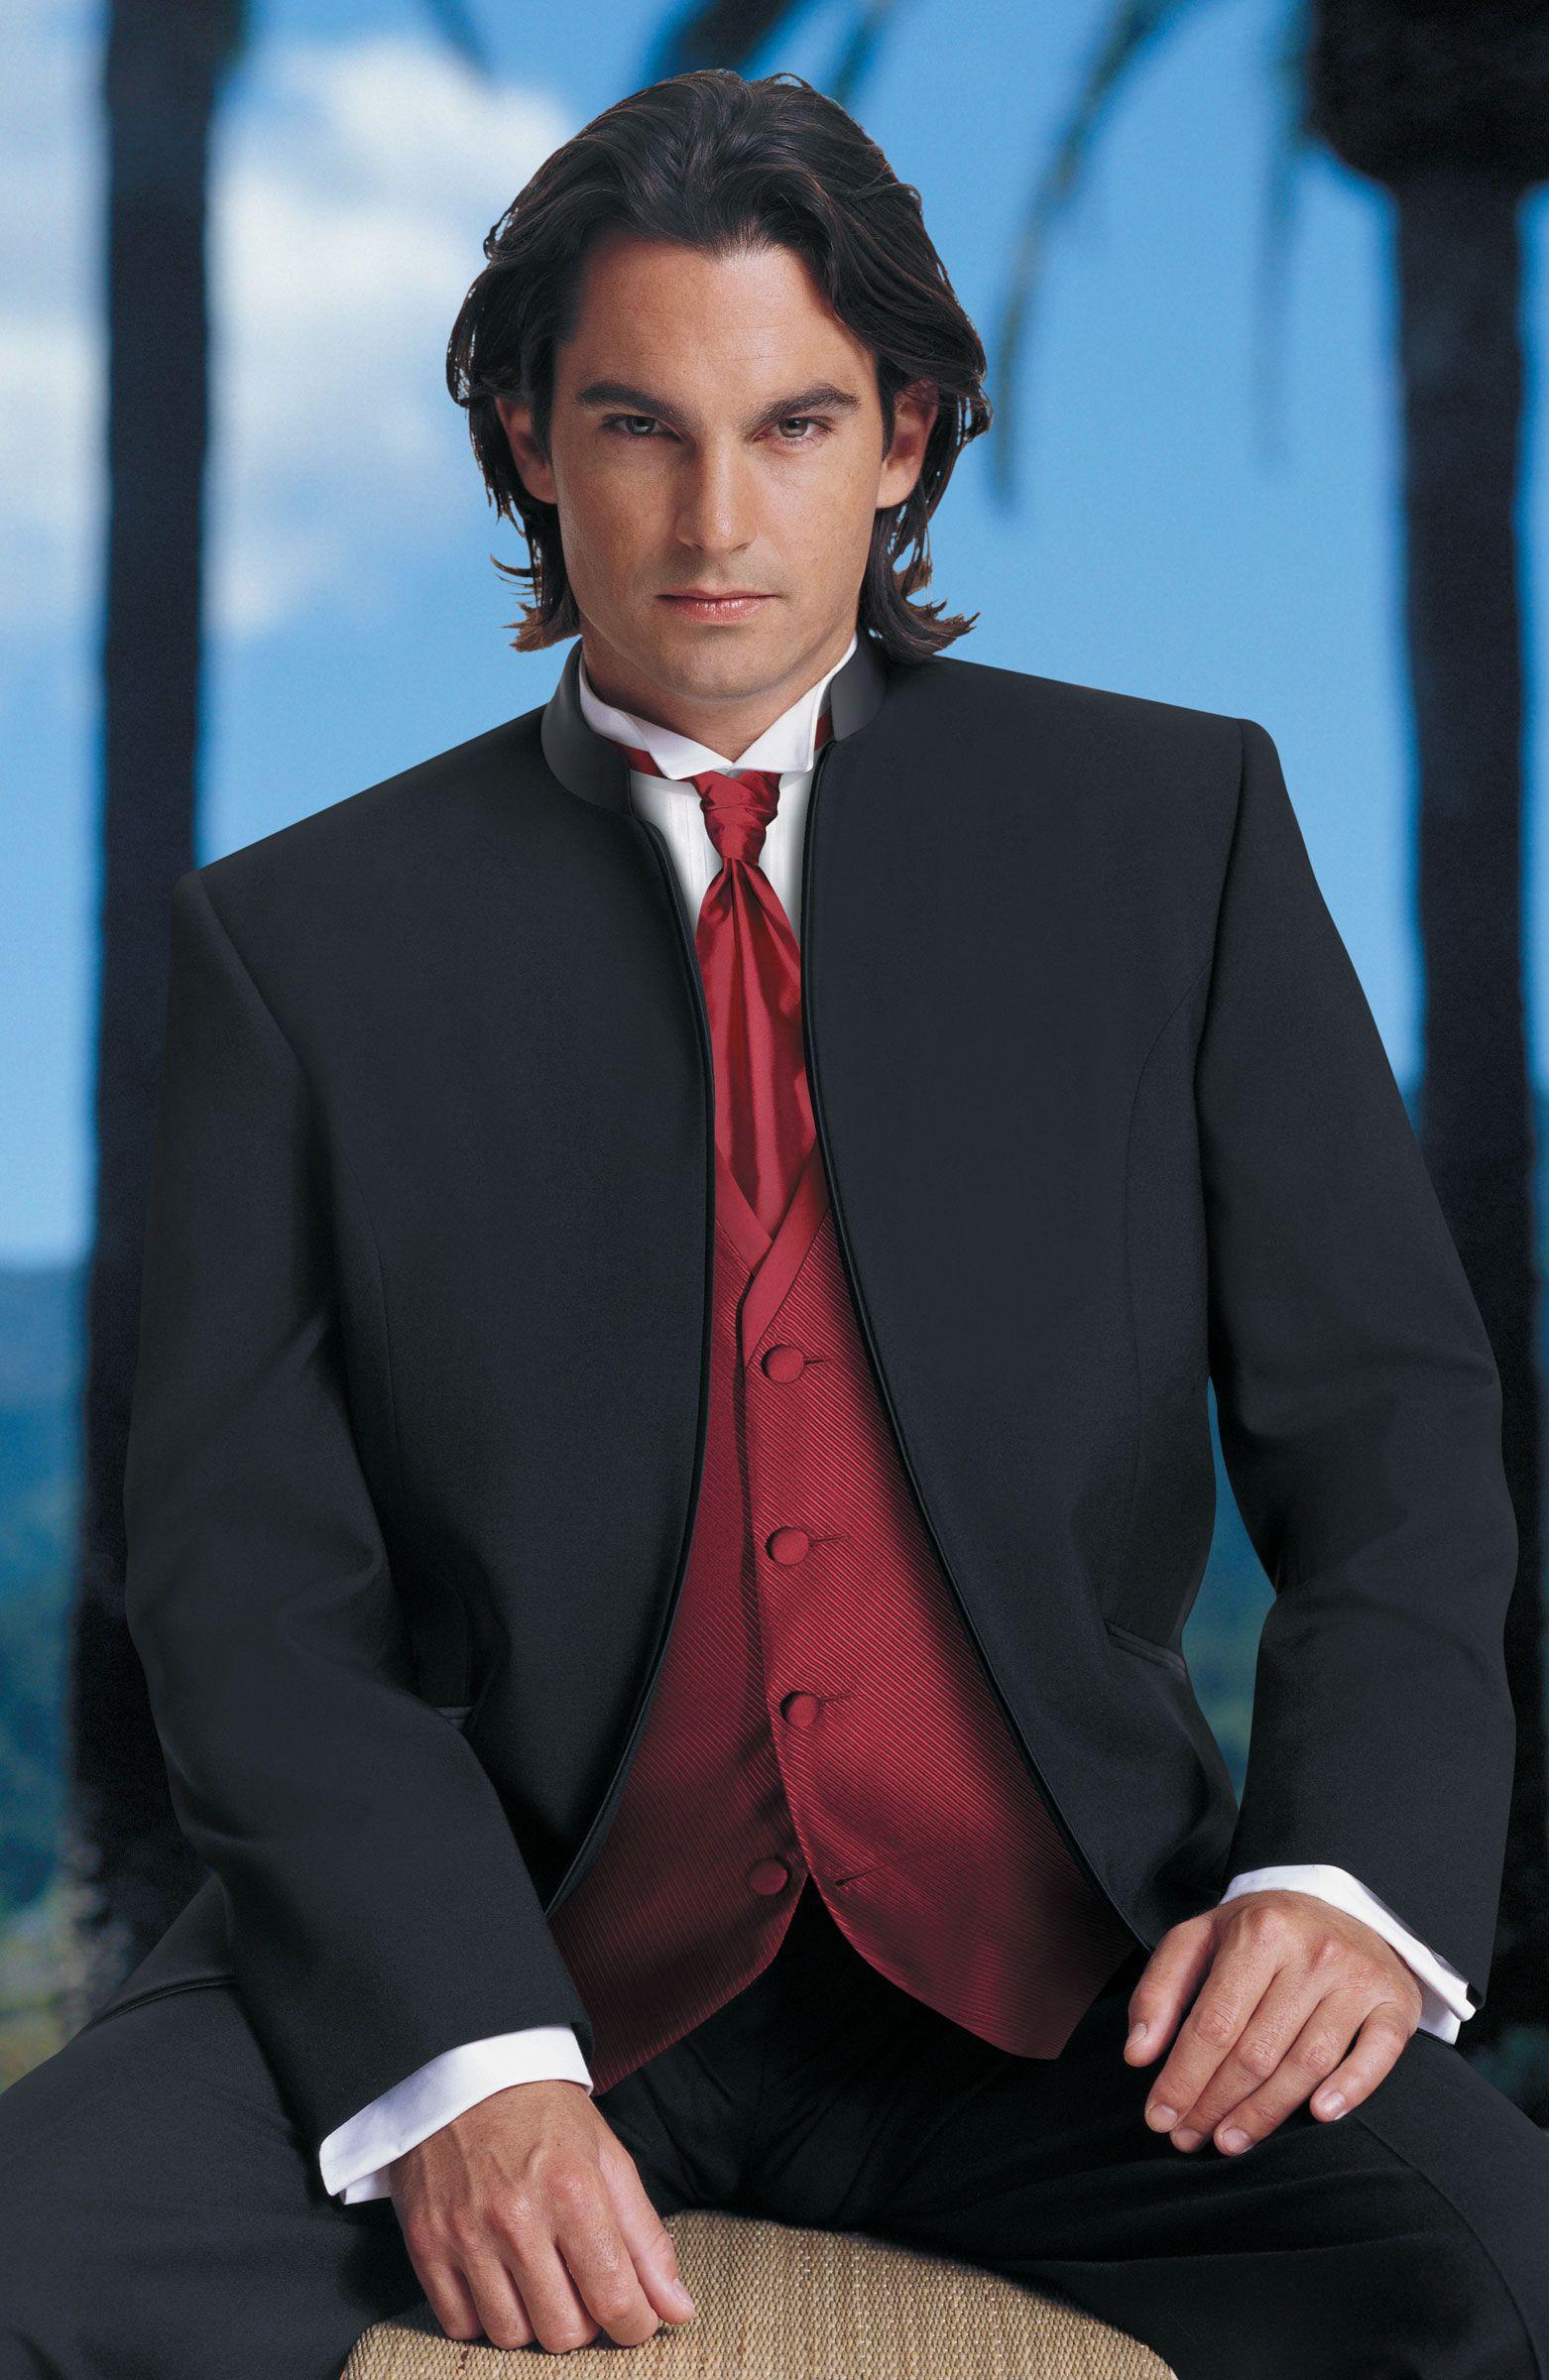 Black tux, red vest | prom | Pinterest | Red vest, Black tux and Tuxedo